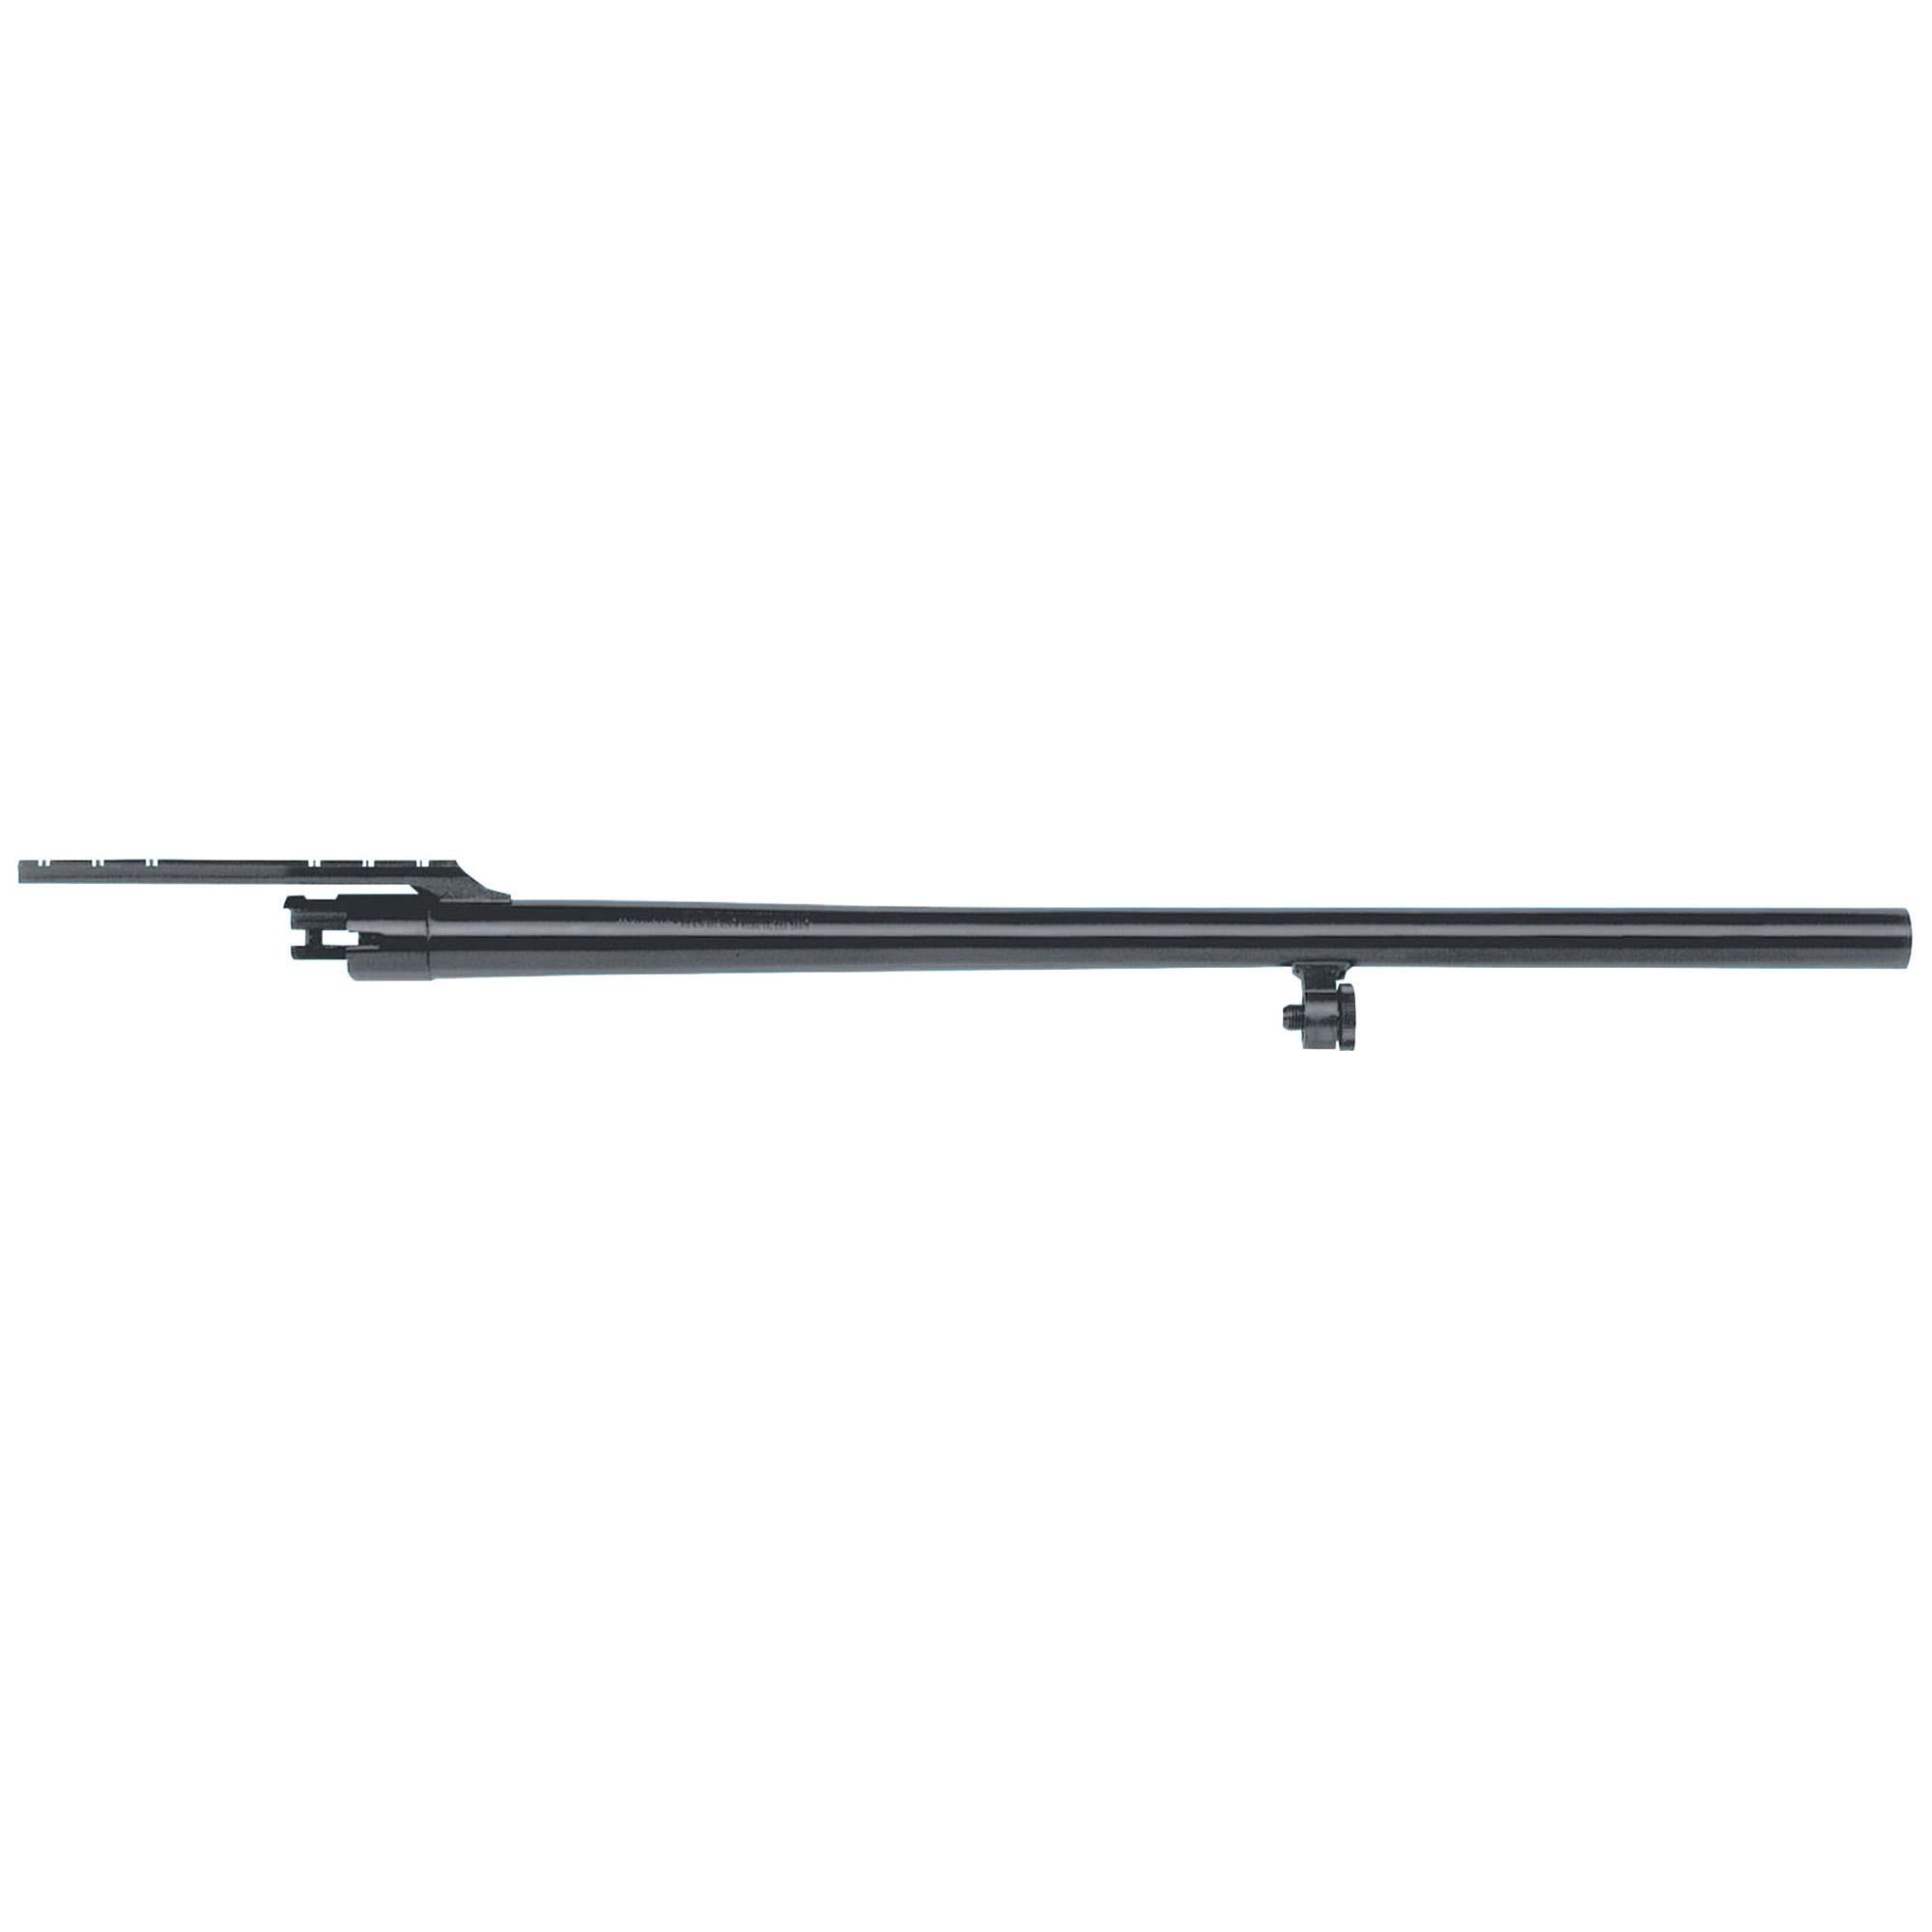 "24"" Slug barrel with cantilever mount"" fully-rifled bore"" and blued finish."